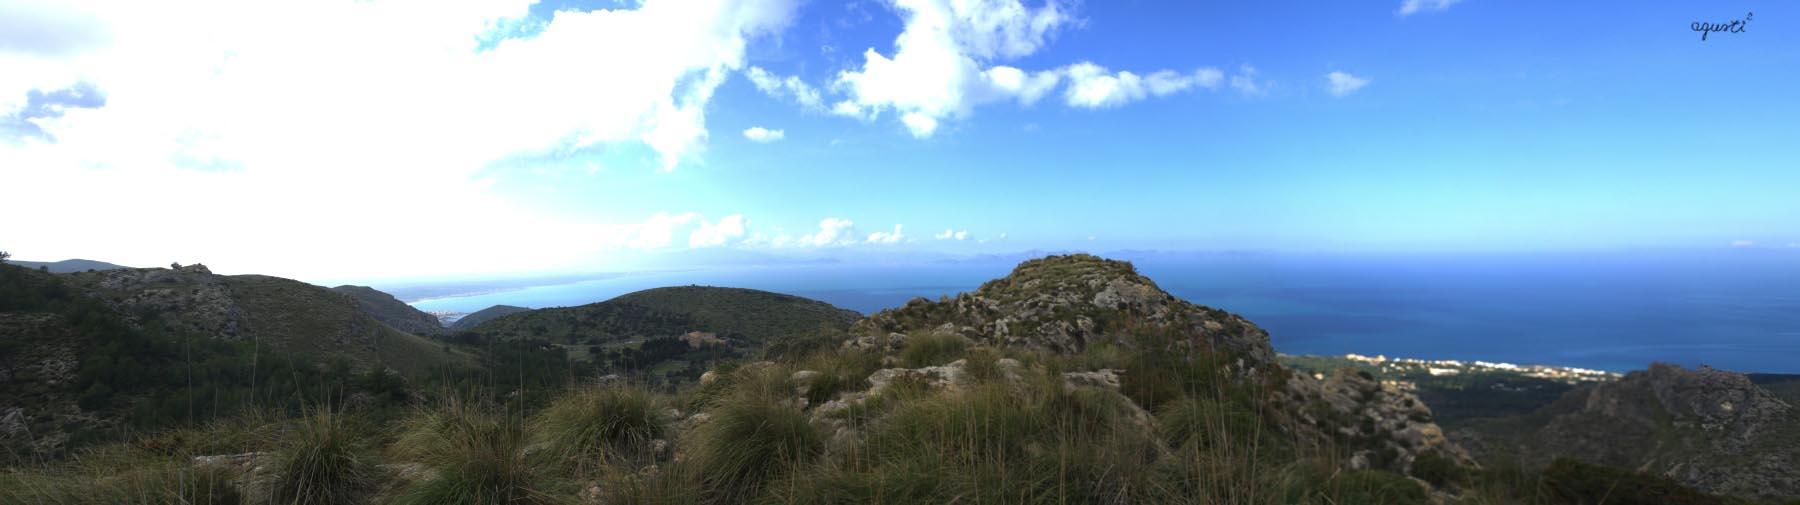 Panoramica -  ermita de Betlem